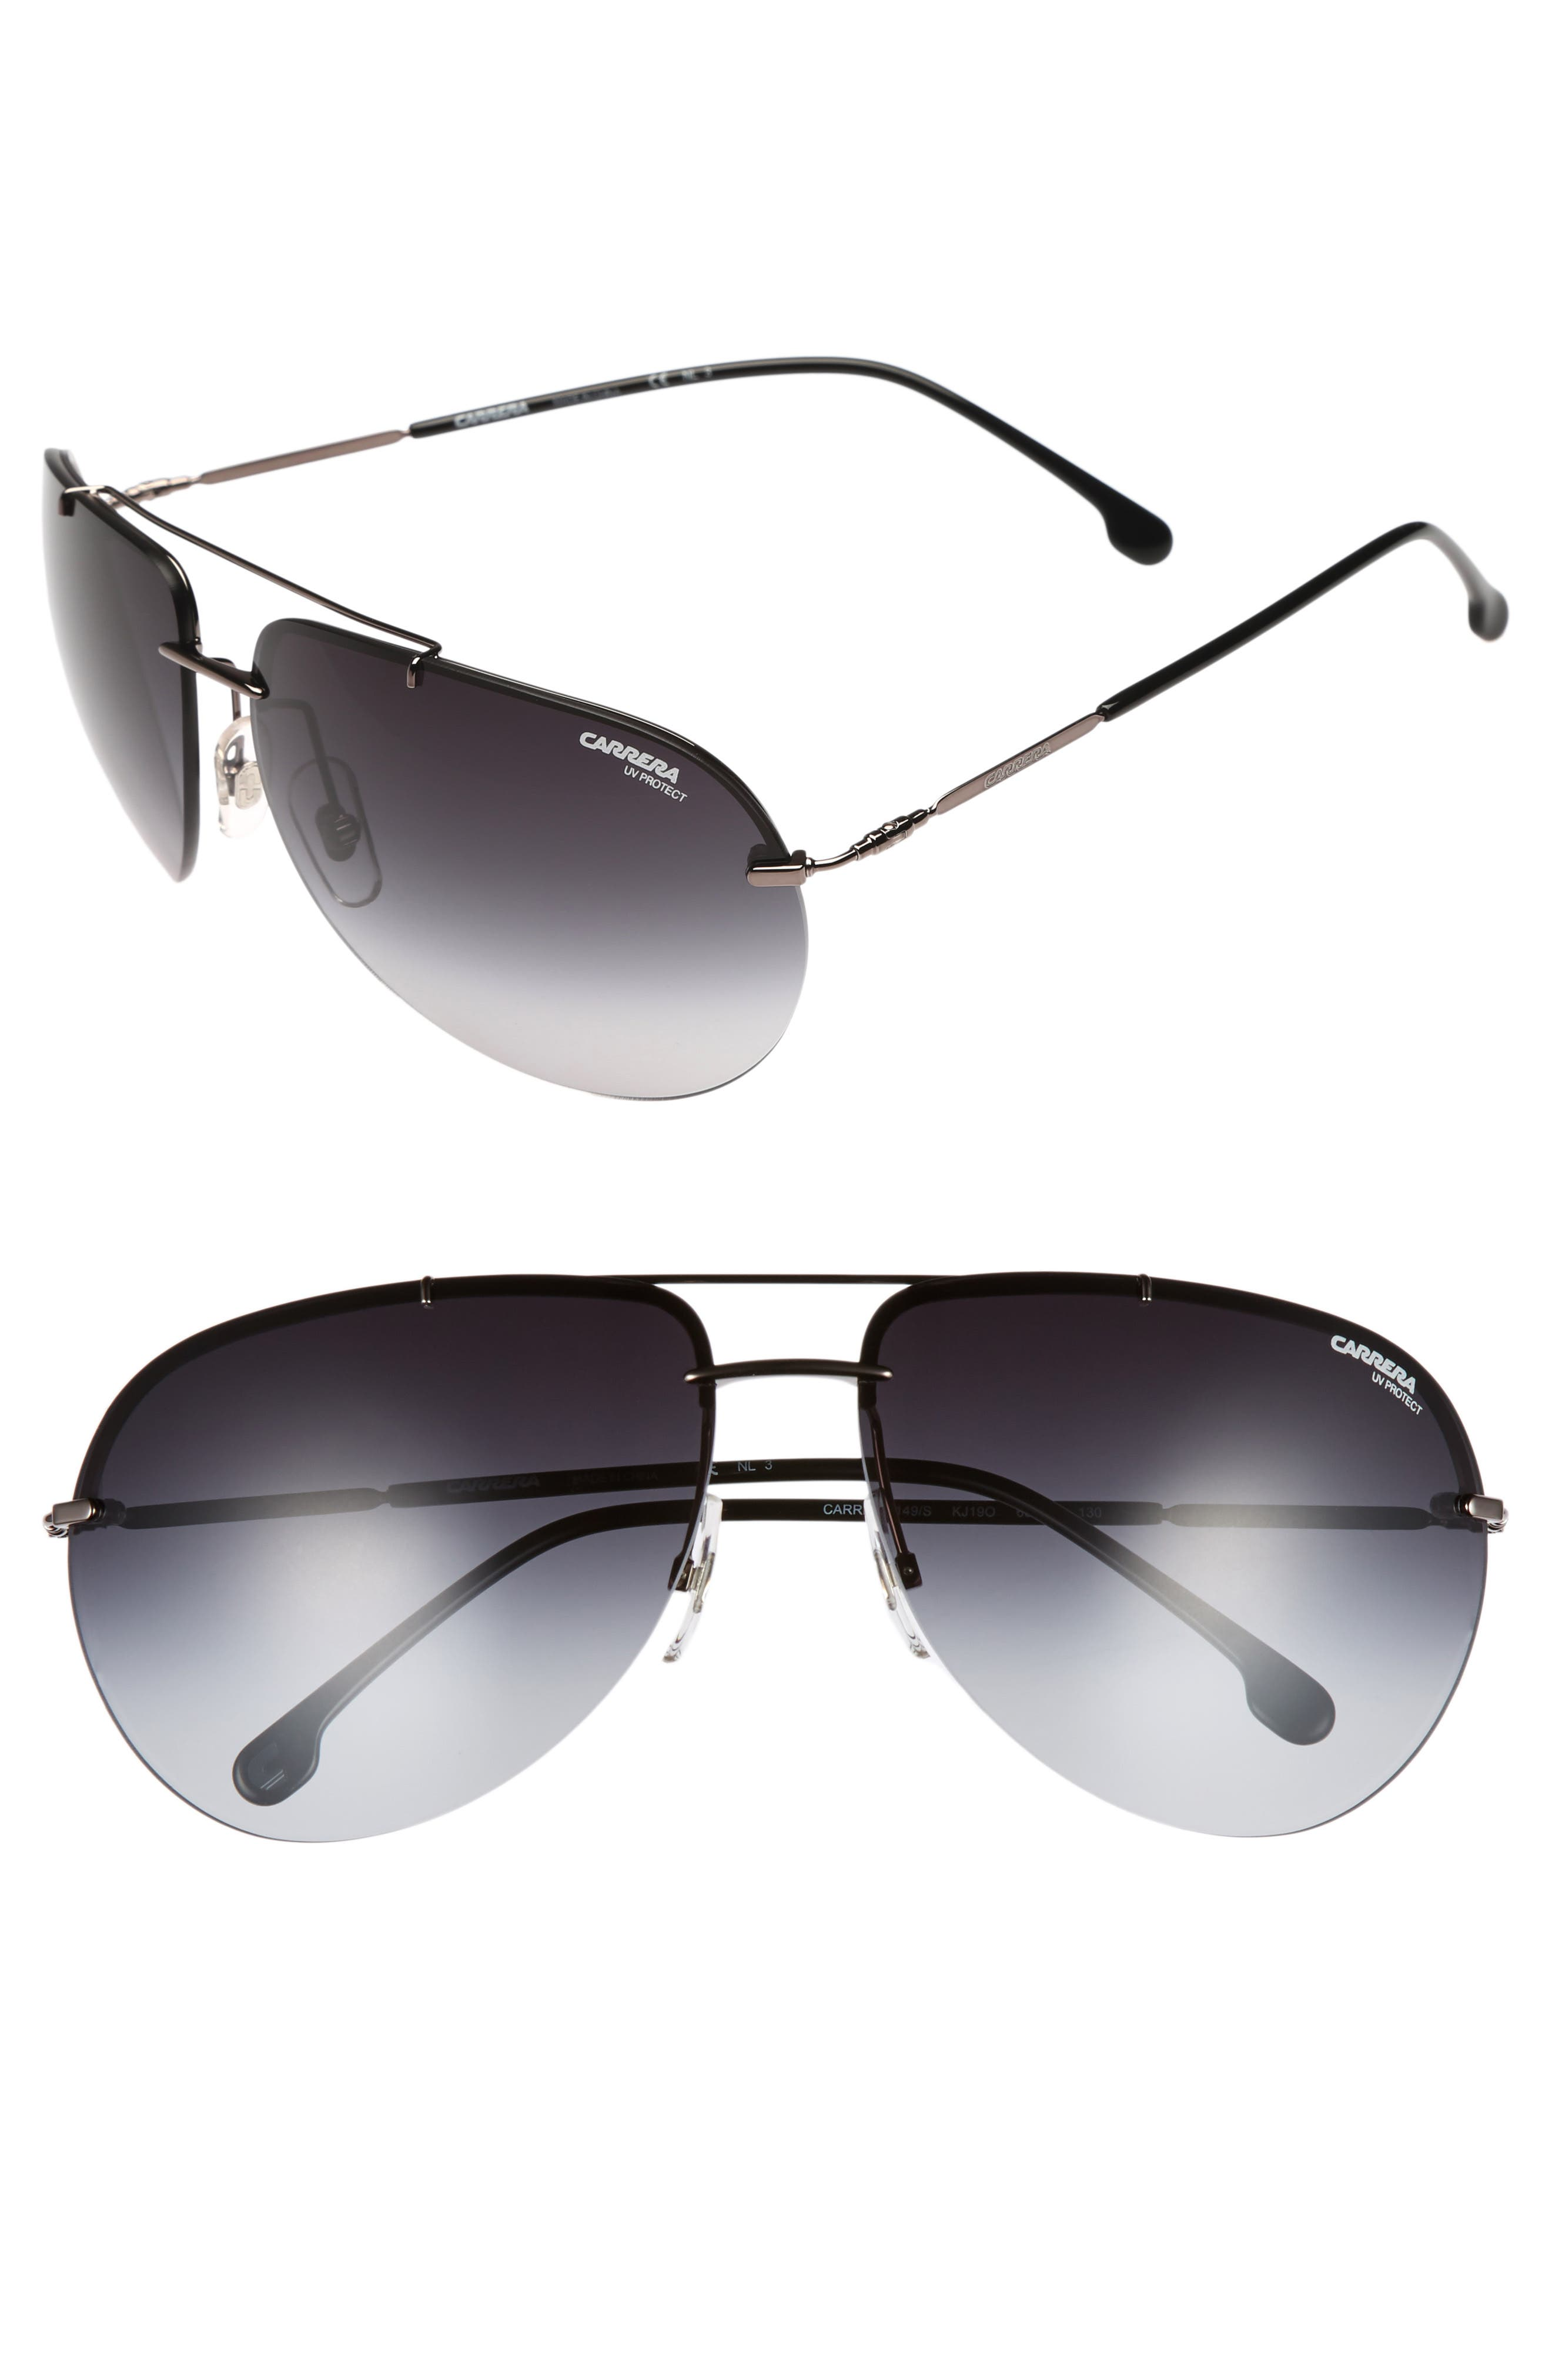 149S 65mm Polarized Aviator Sunglasses,                             Main thumbnail 1, color,                             DARK RUTHENIUM / GRAY GRADIENT